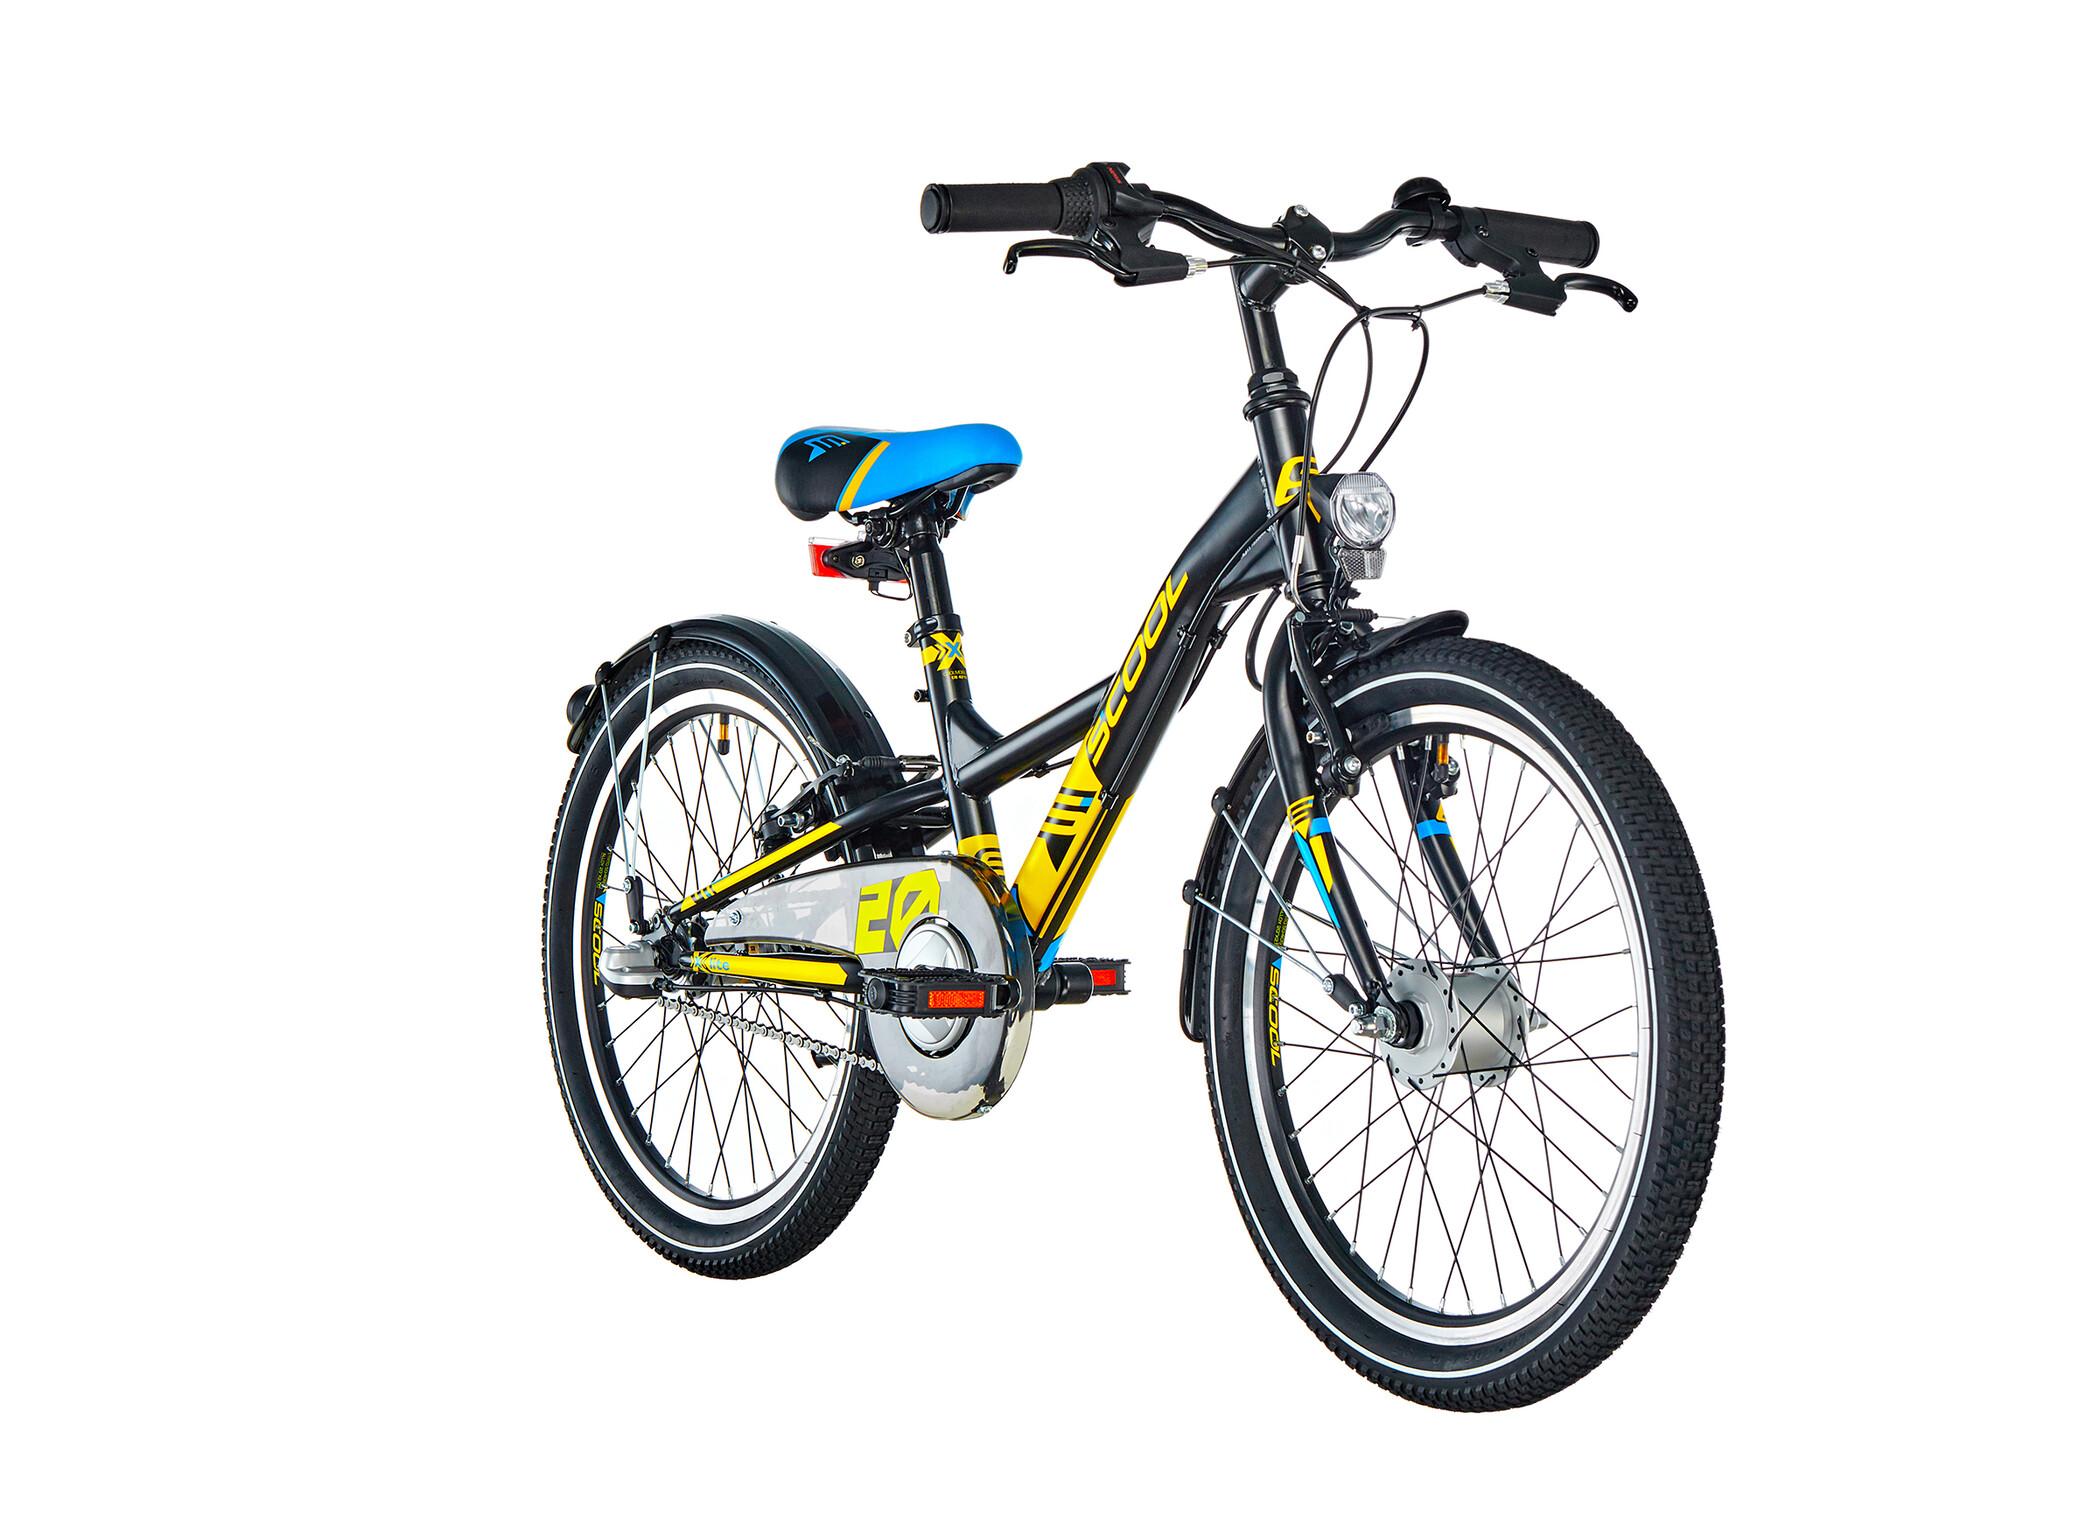 s'cool XXlite 20 3-S Steel Børn, black/yellow matt (2020) | City